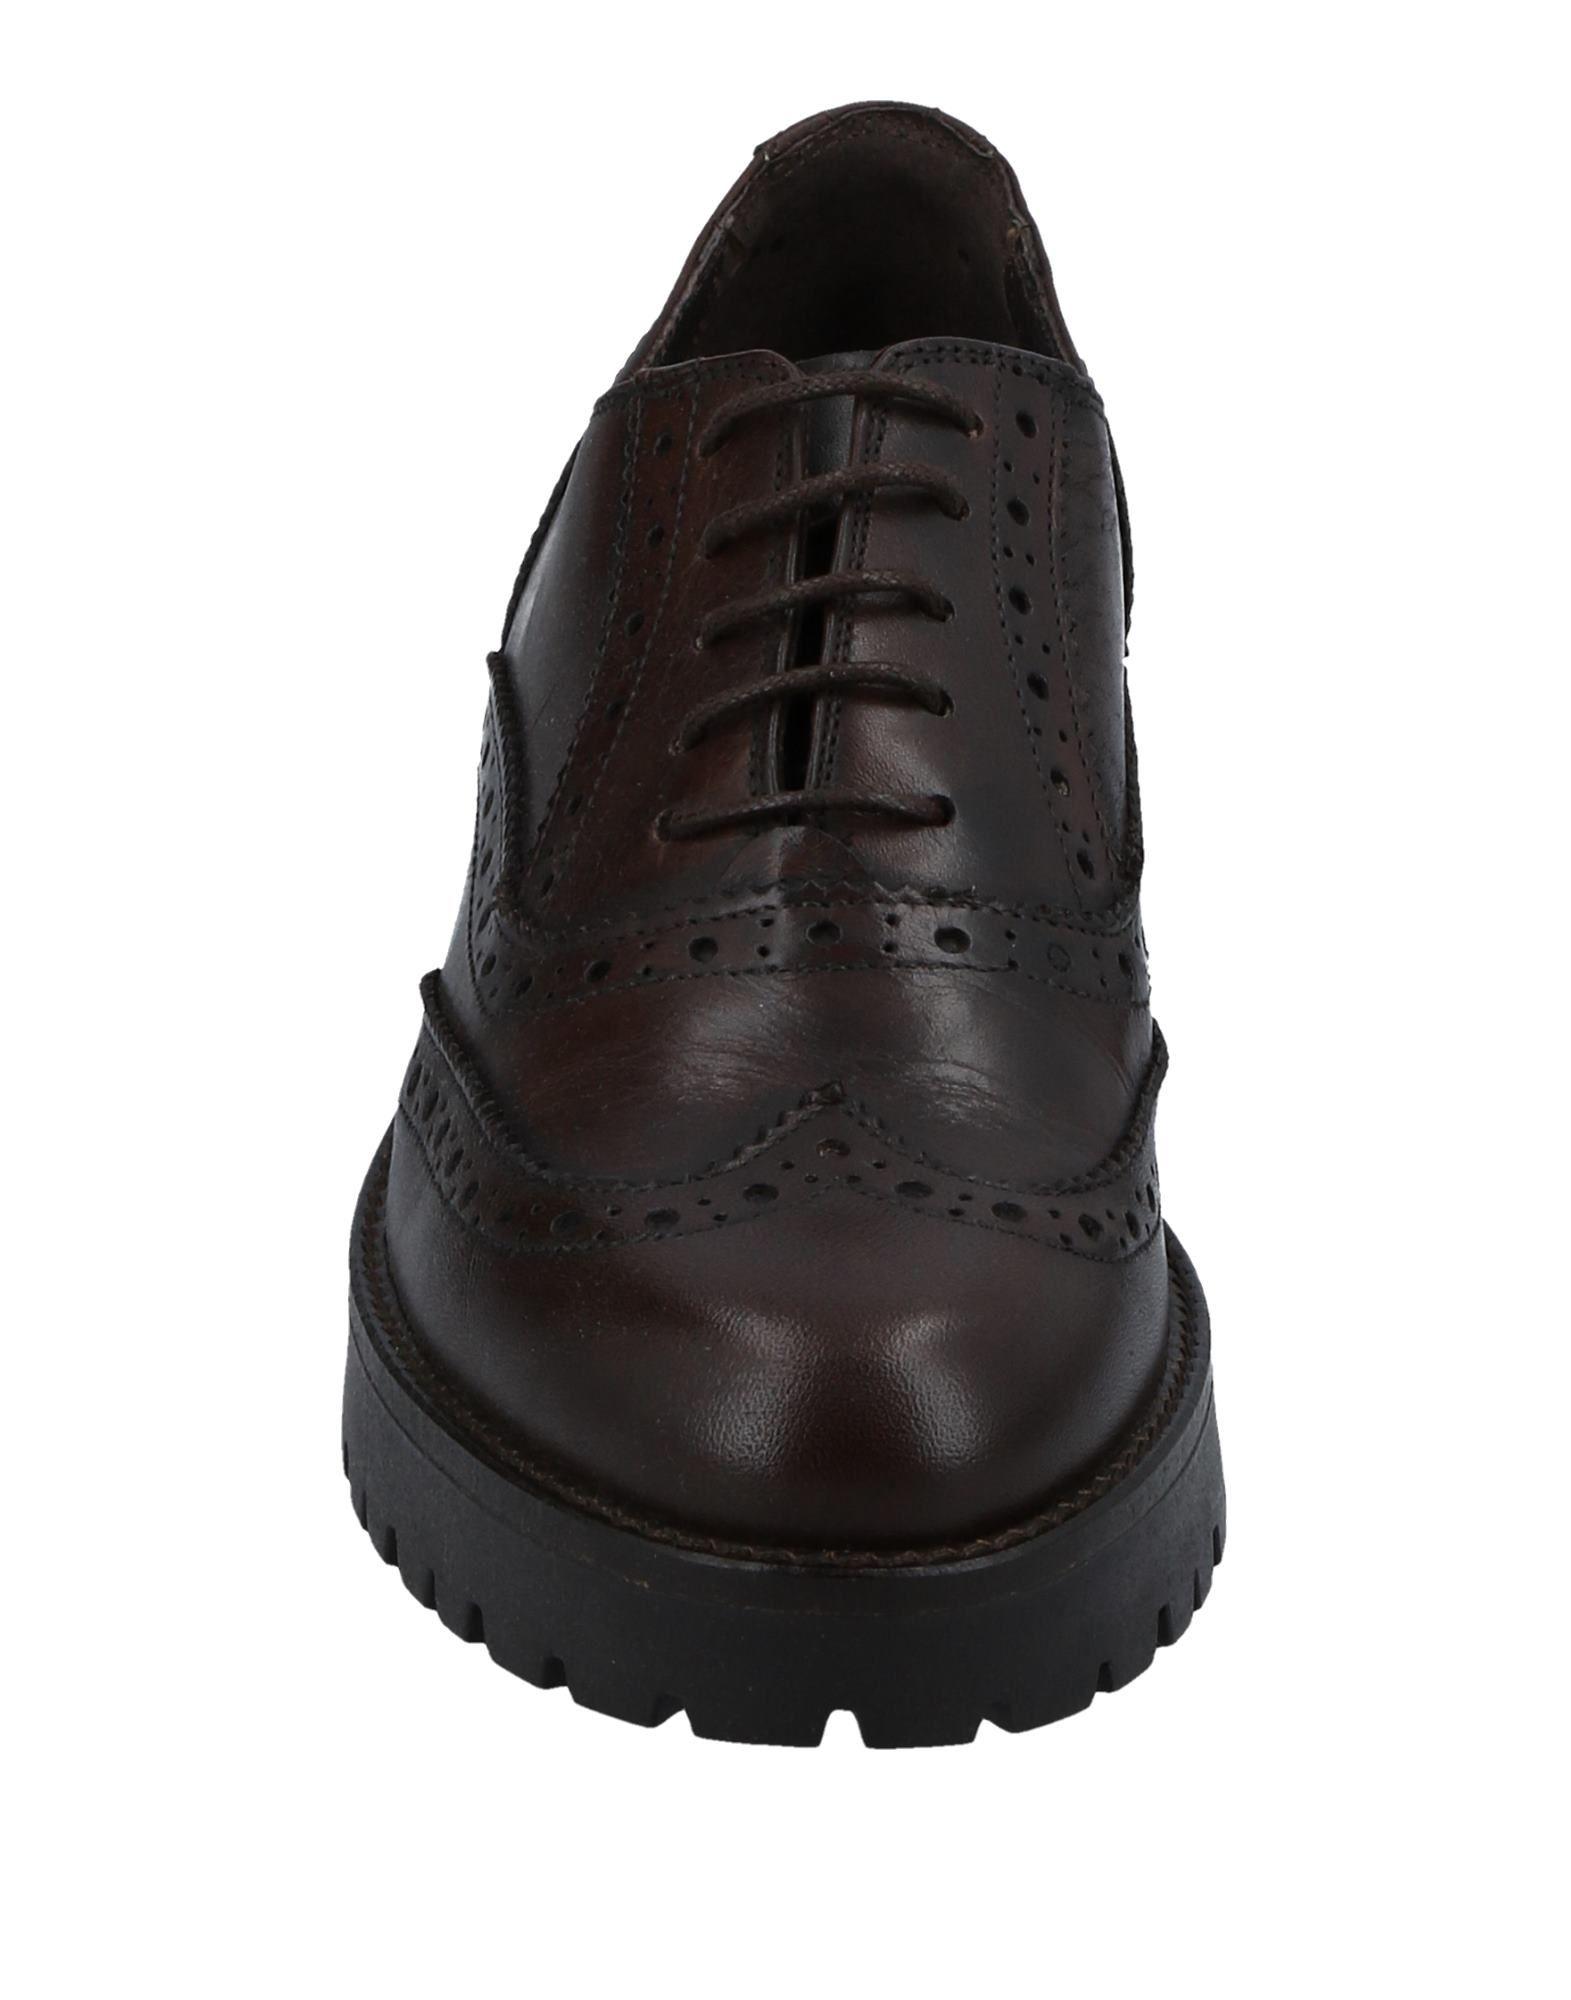 Le Bilò Schnürschuhe Damen  Schuhe 11502229LH Gute Qualität beliebte Schuhe  c43768